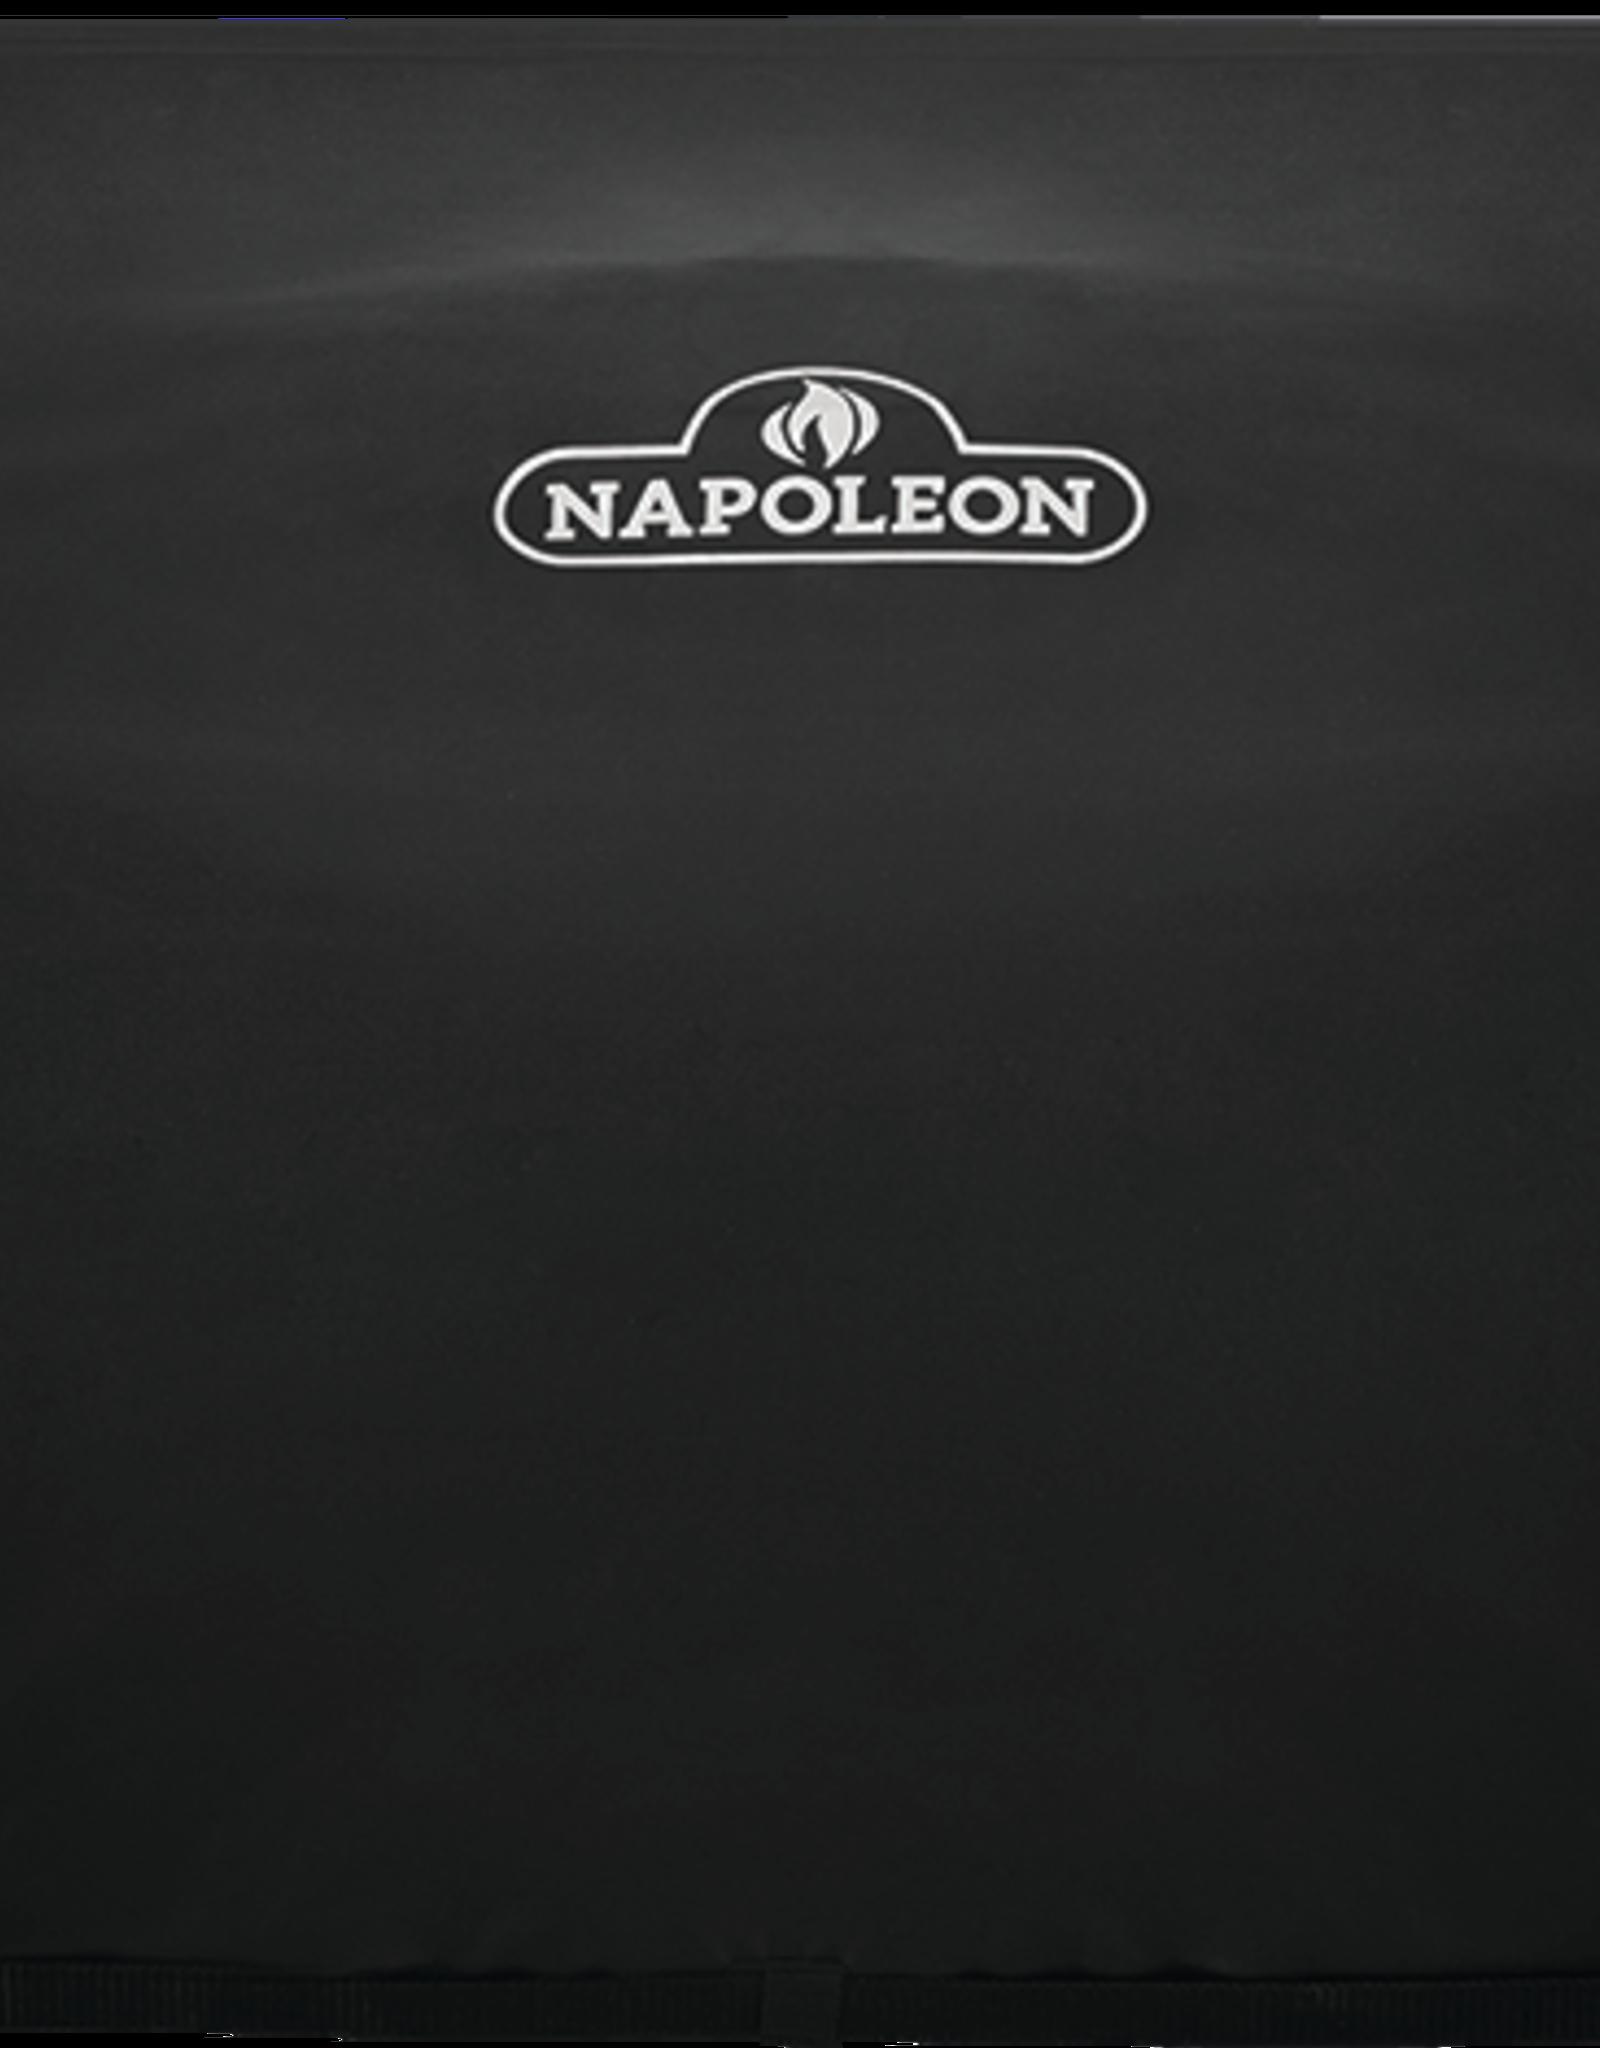 Napoleon Napoleon 700 Series 44 Built-in Cover - 61842